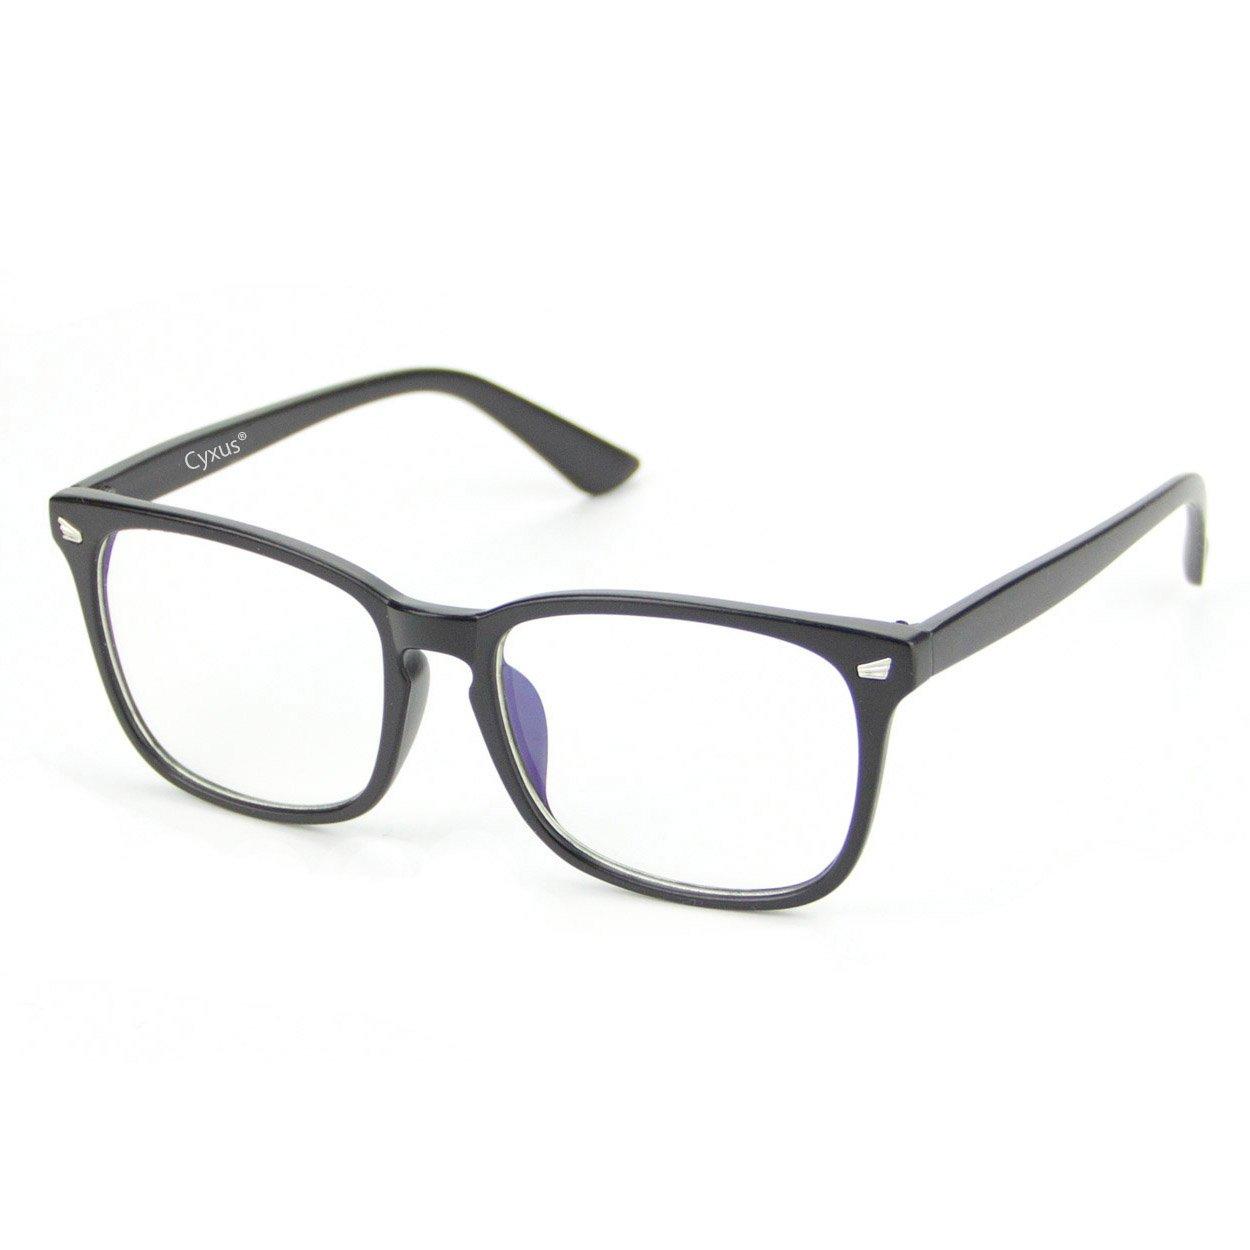 Cyxus Retro Frame Clear Lens, Plain Glasses Matte Black Frame Cyxus Technology Group Ltd